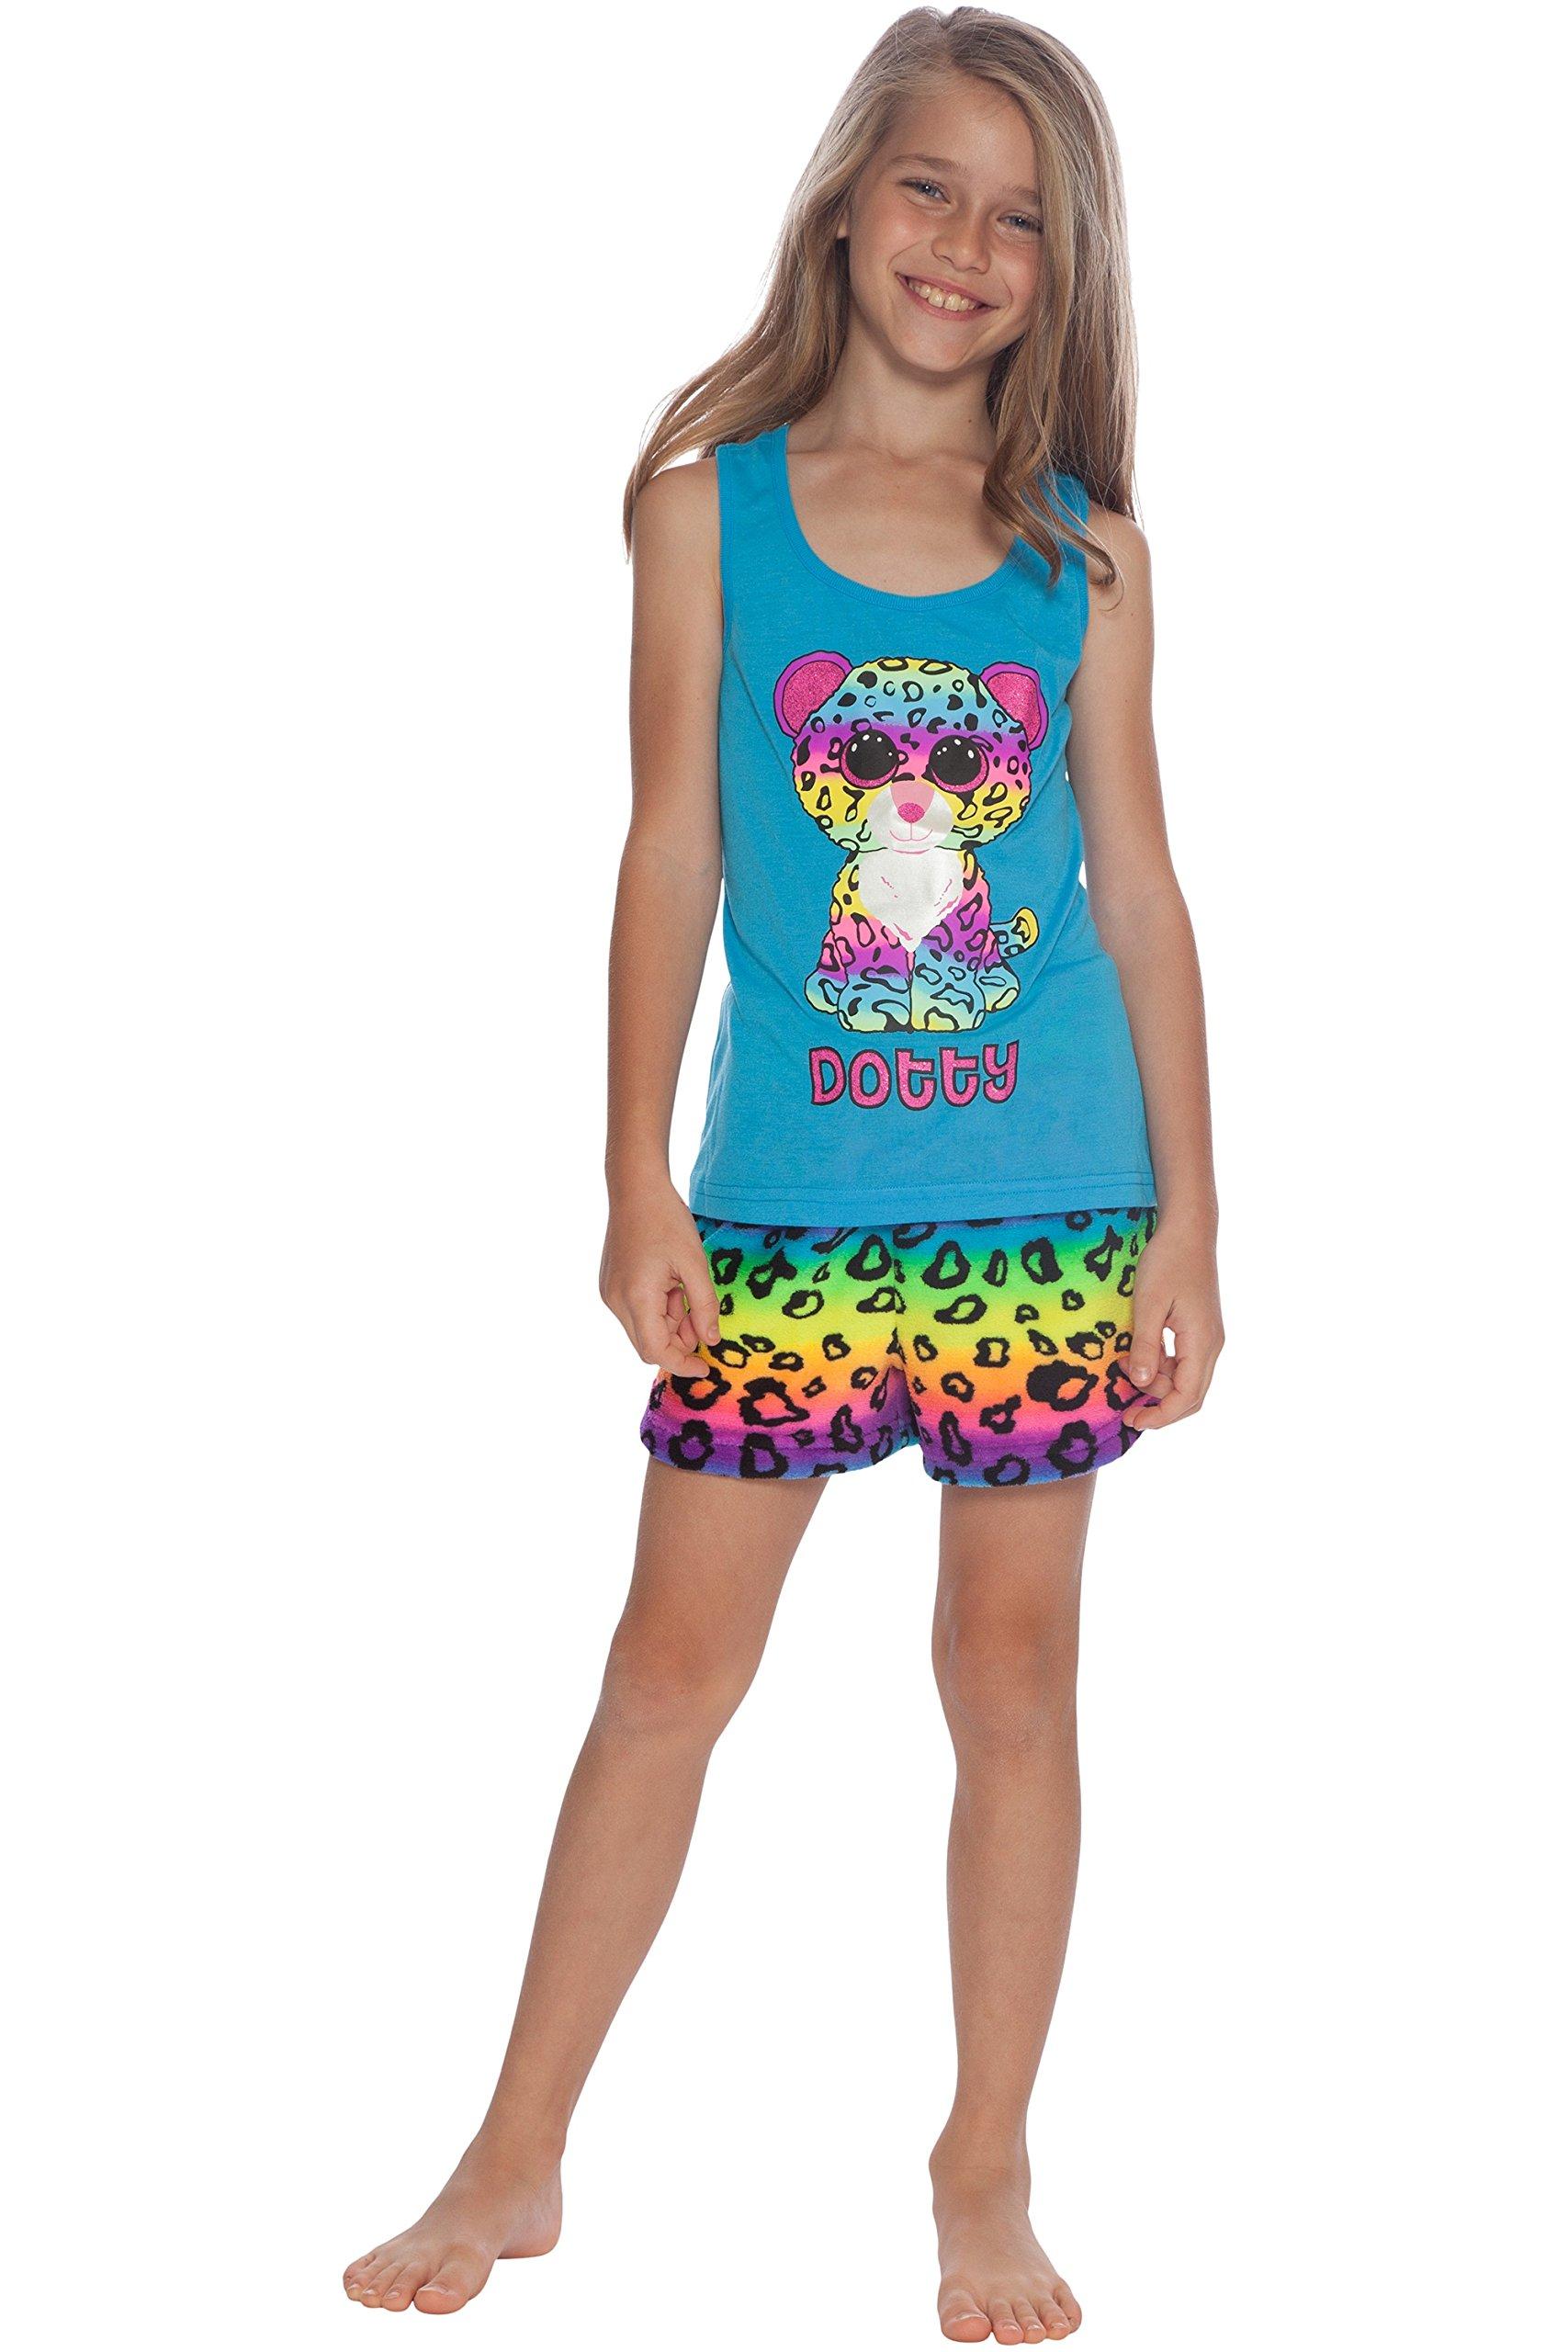 TY Beanie Boo Little Girls' Beanie Boo Dotty Racerback Pajama Short Set, Multi, 6/6X